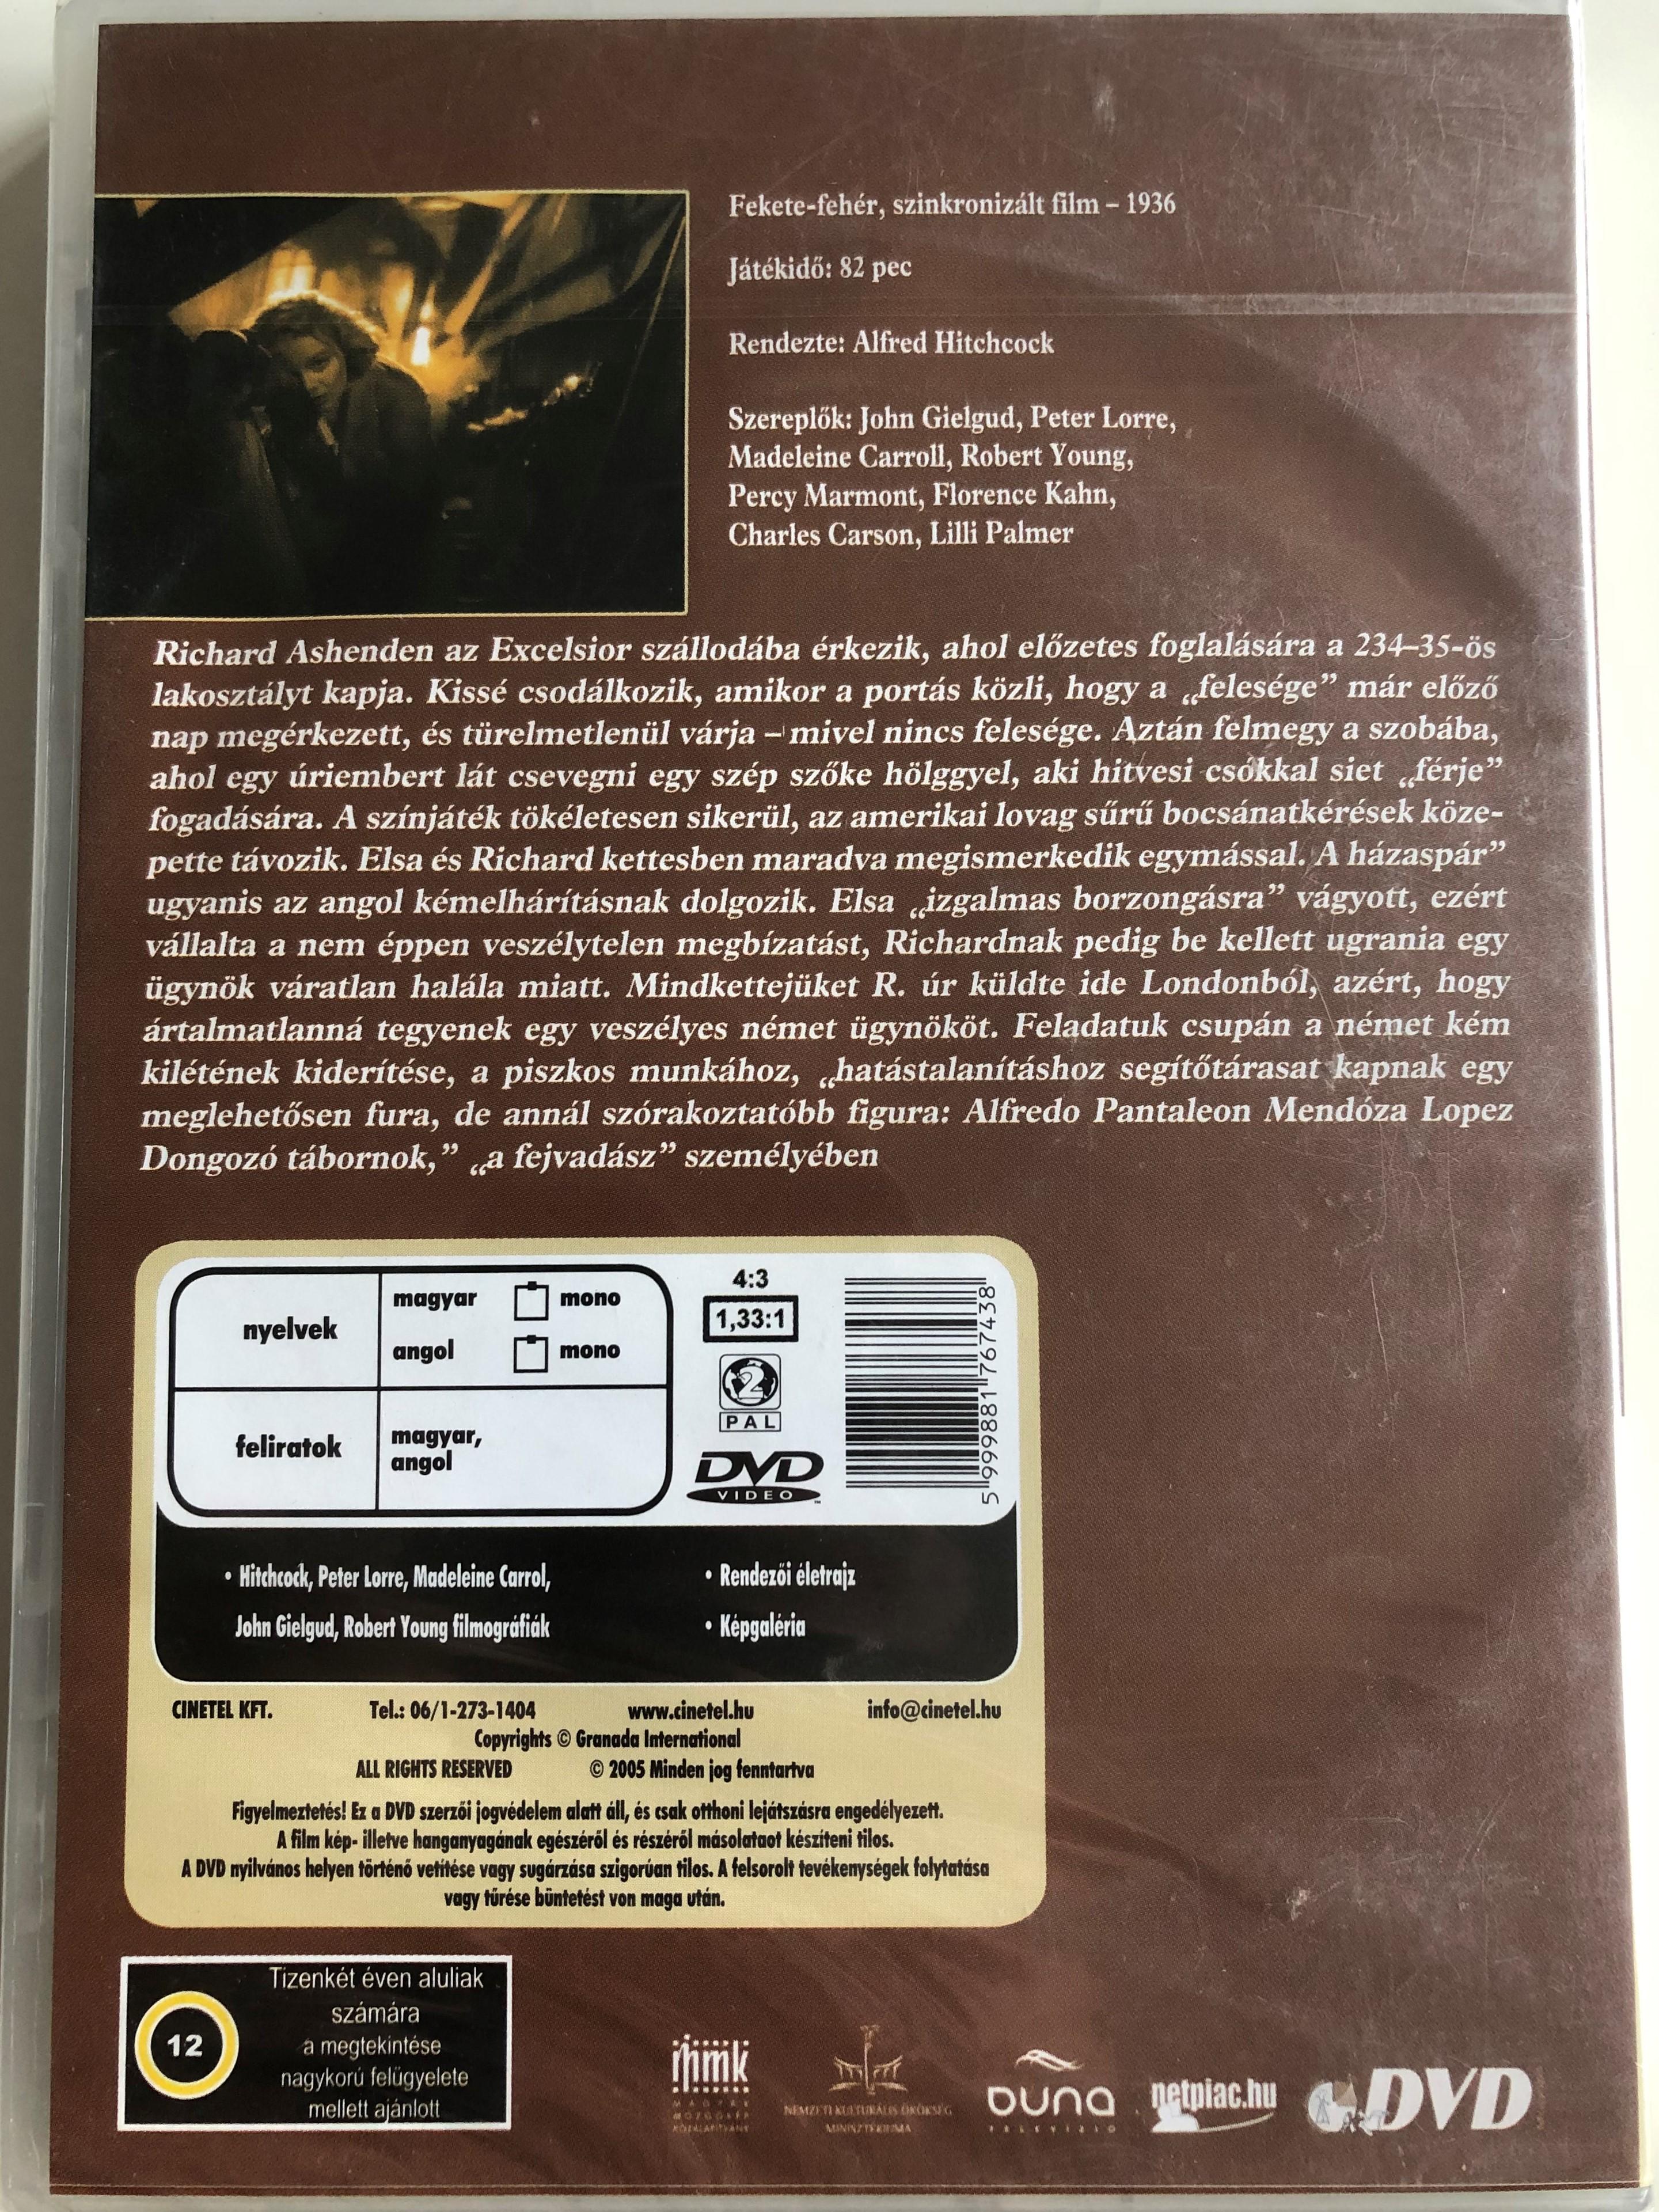 secret-agent-dvd-1936-titkos-gyn-k-directed-by-alfred-hitchcock-2.jpg